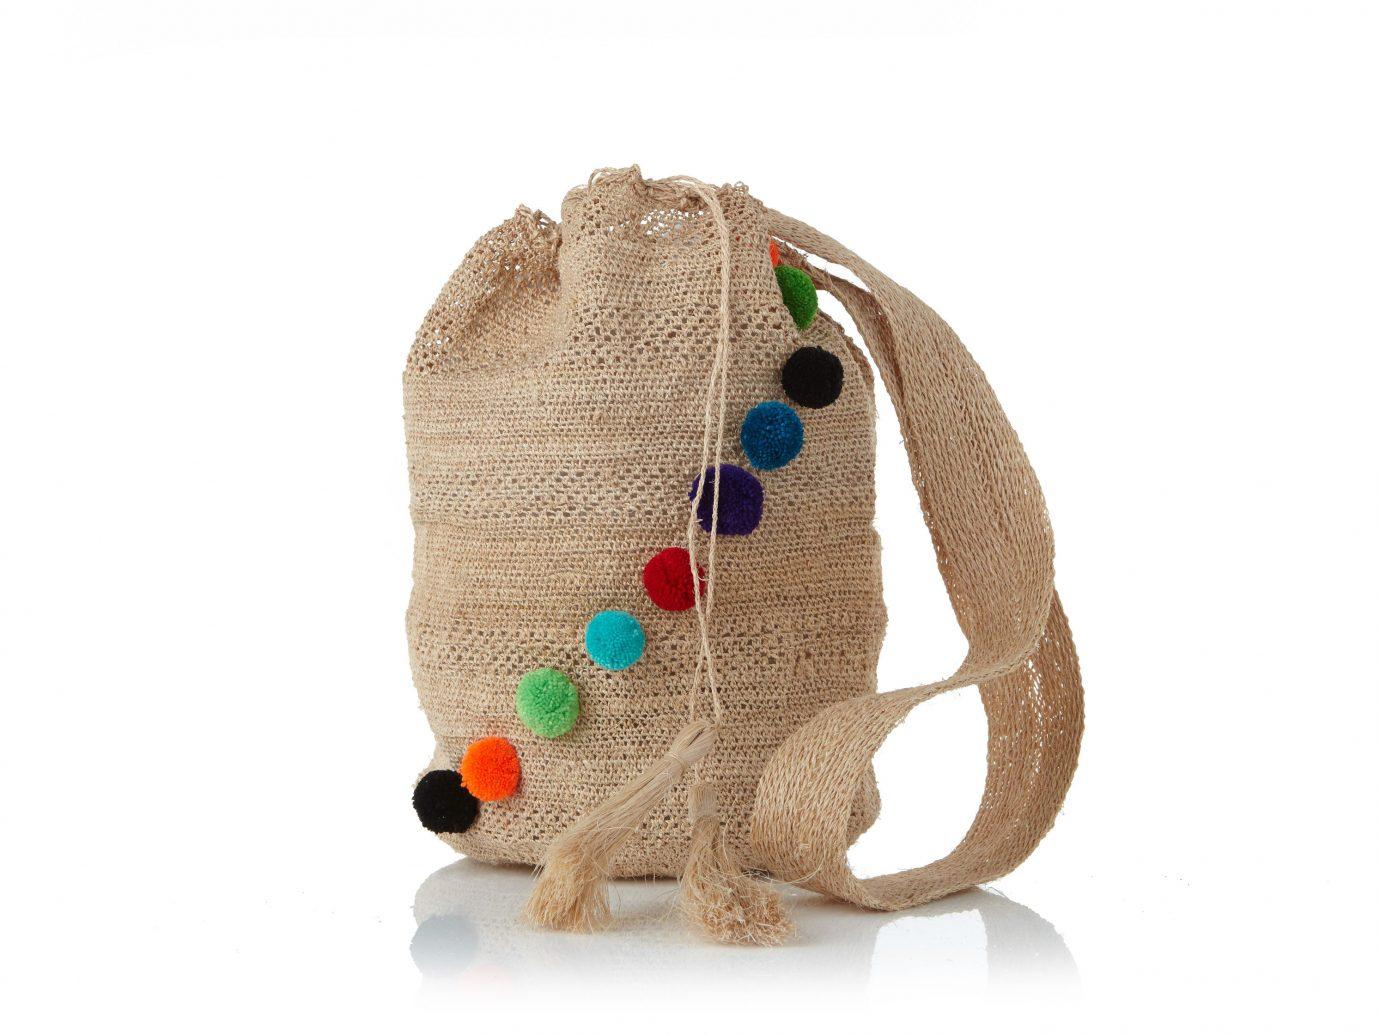 Style + Design mammal stuffed toy cloth toy plush textile beige